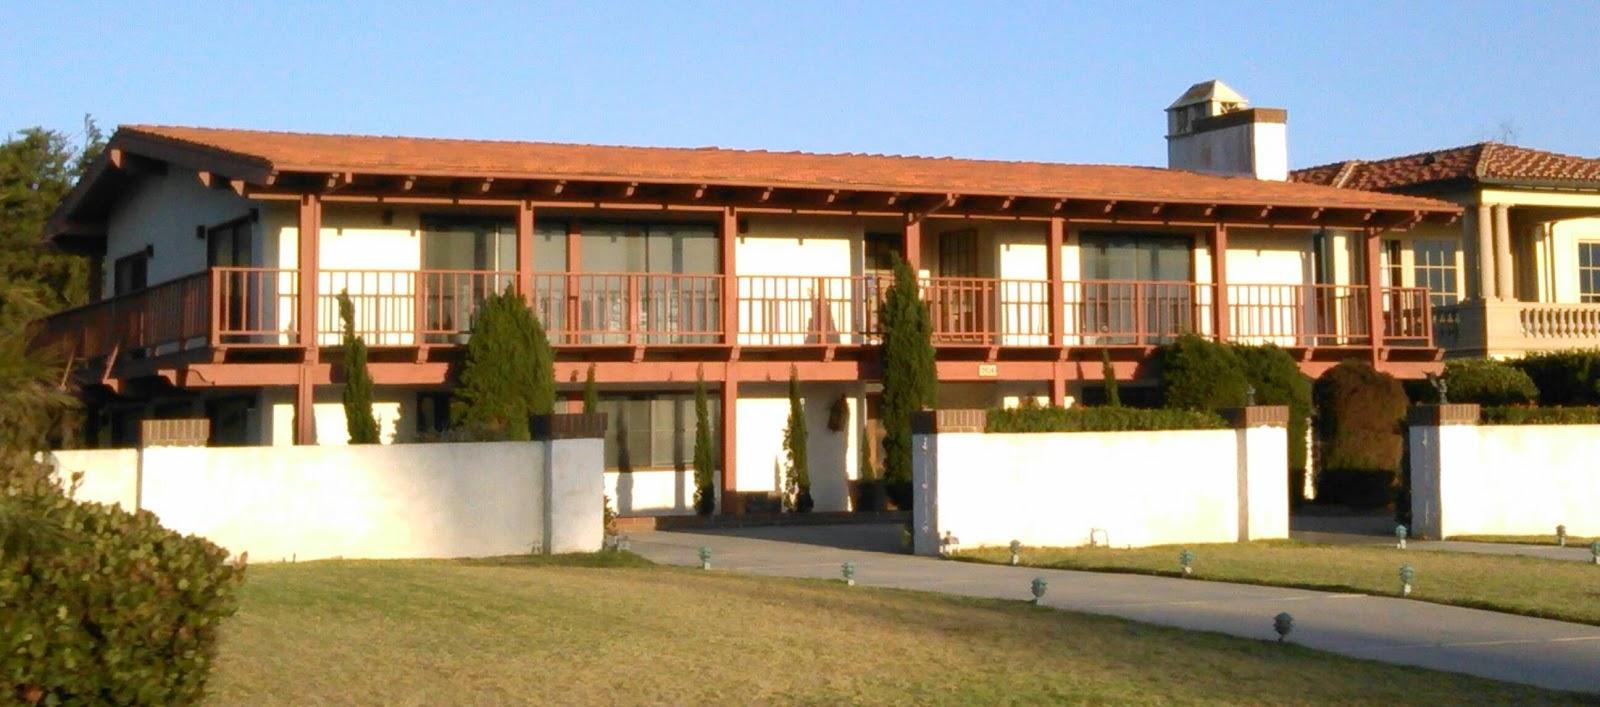 LOCAL COLOUR #1: GLORY 2 GOD !: a few palos verdes houses